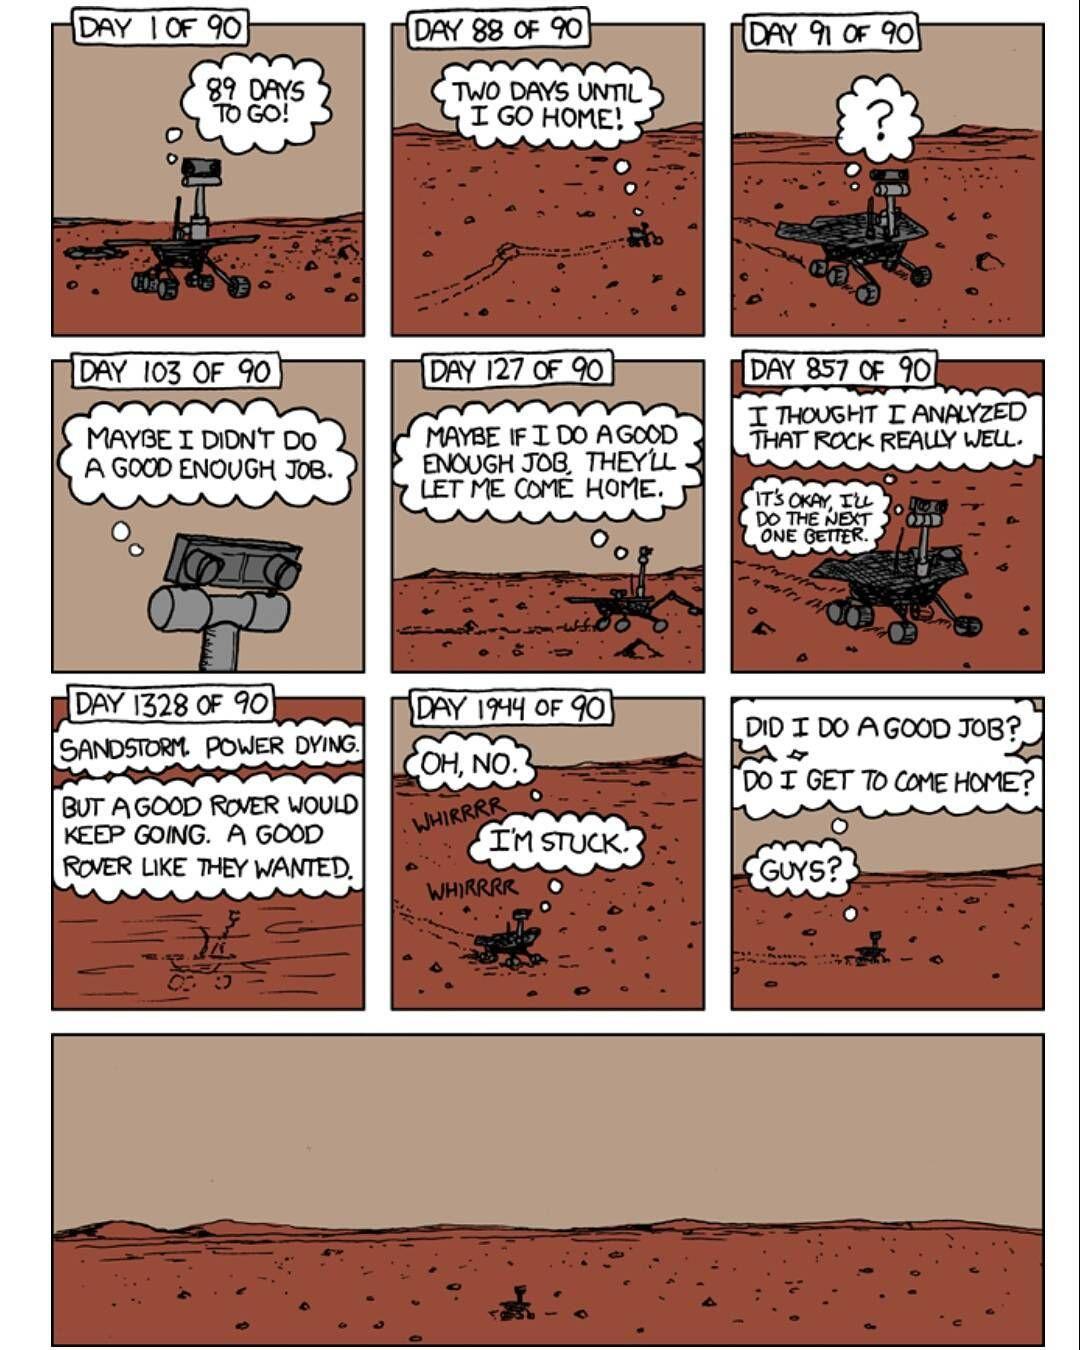 mars rover meme - photo #30